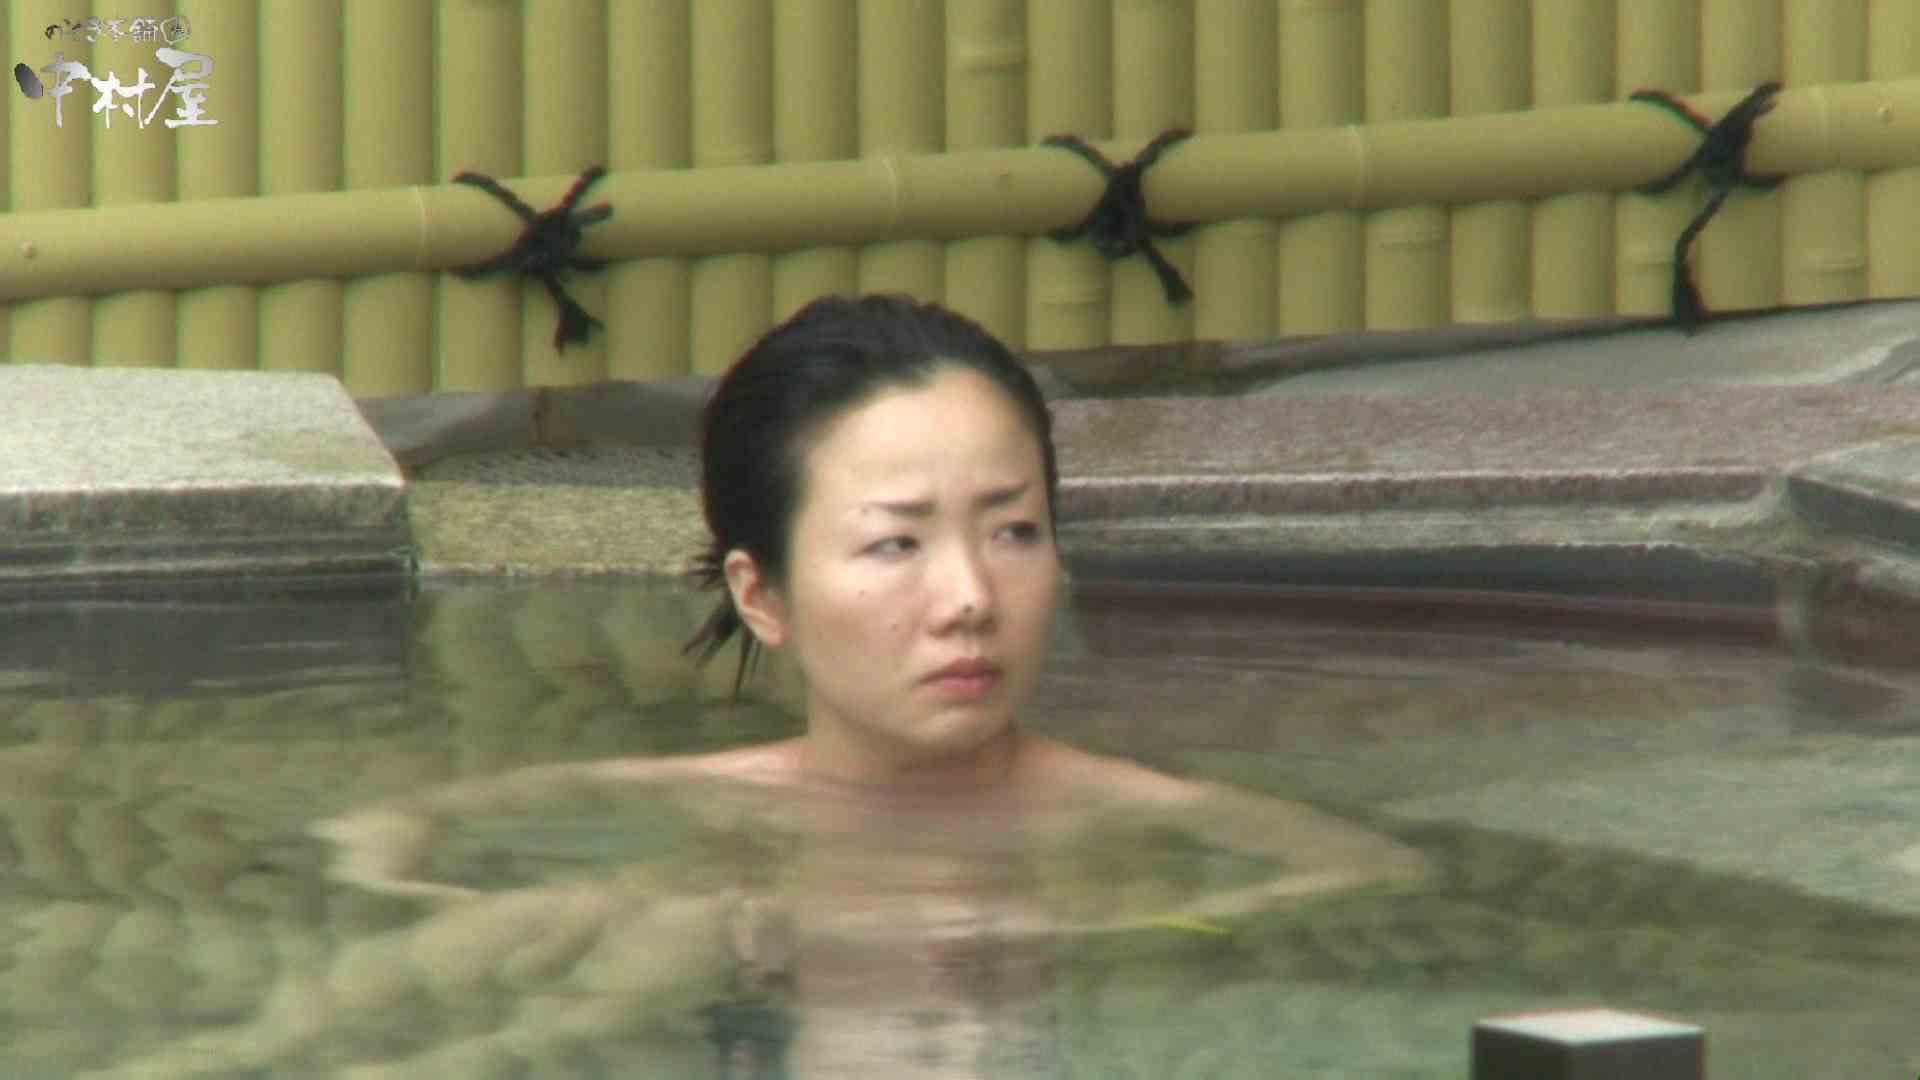 Aquaな露天風呂Vol.950 盗撮シリーズ   露天風呂編  80PIX 27